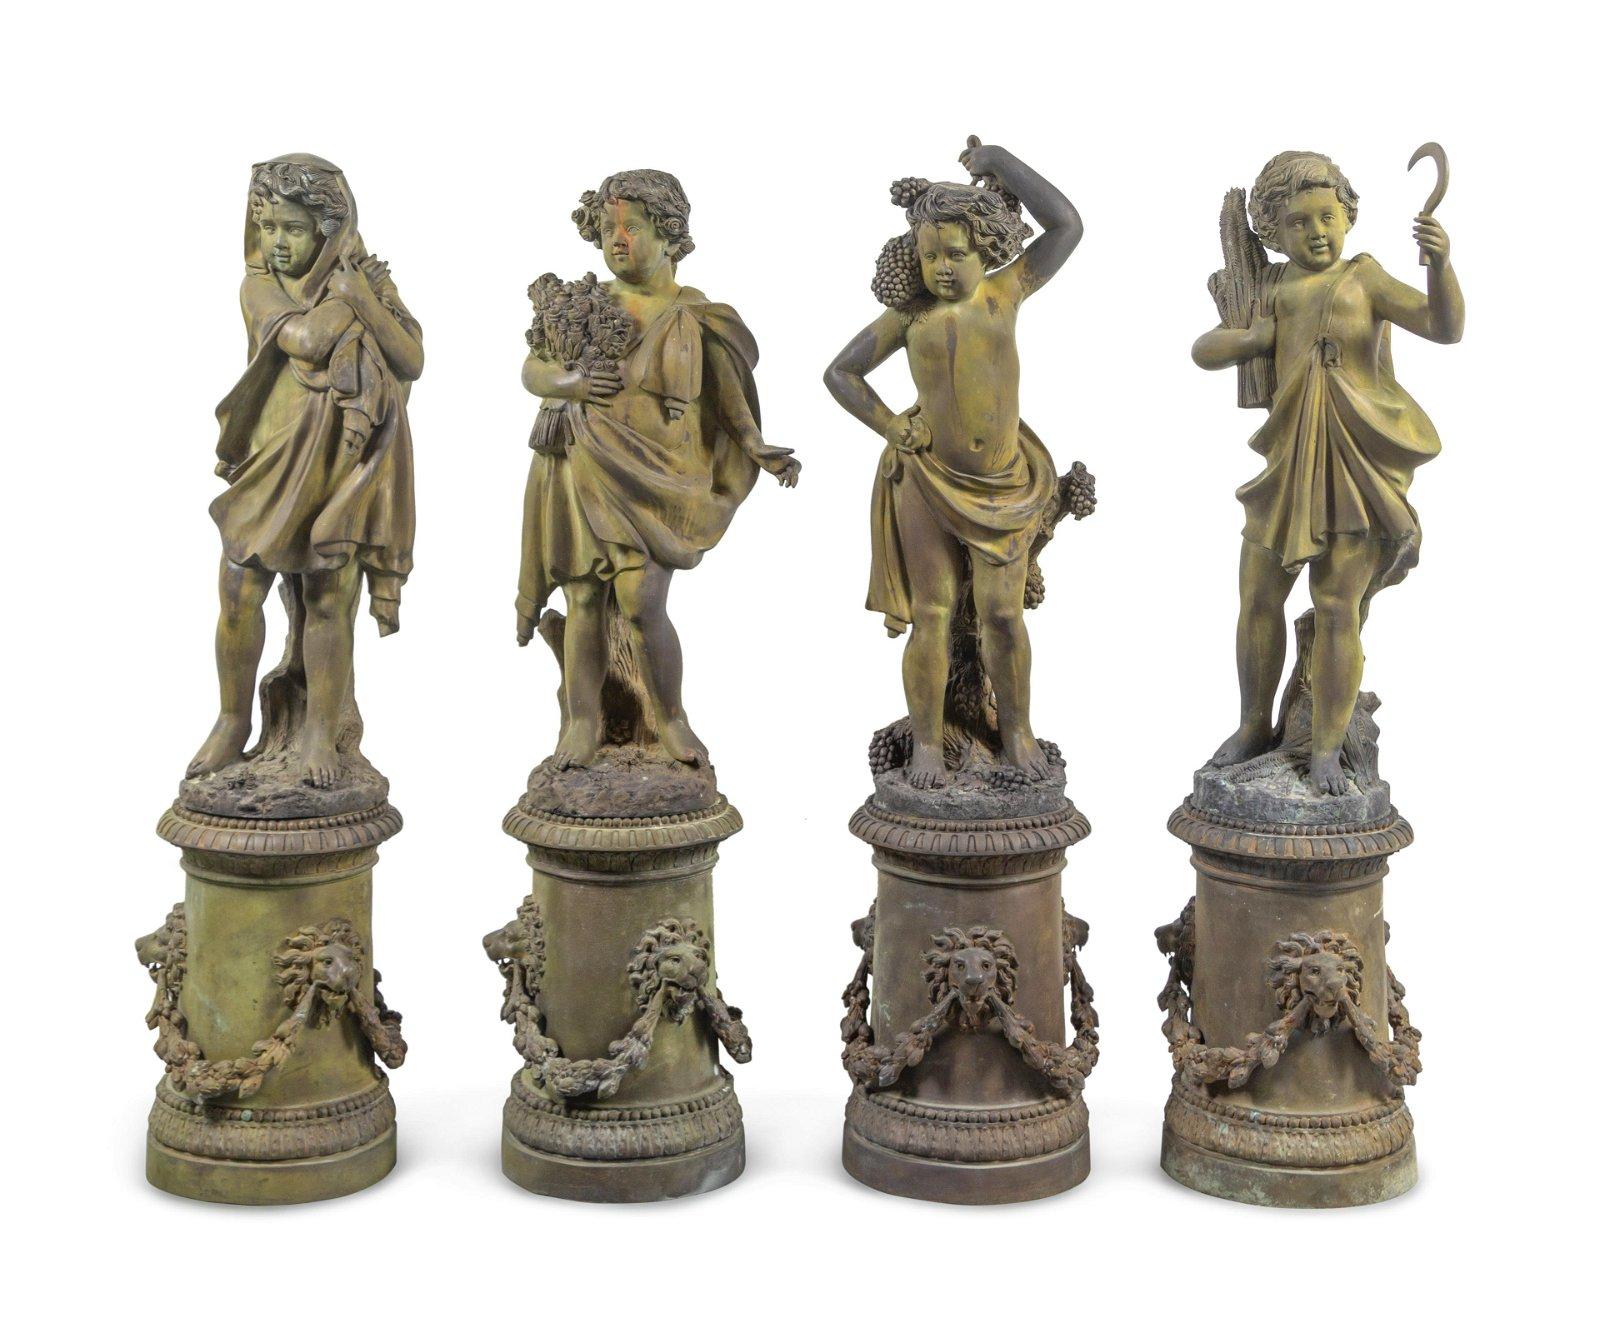 A Set of Four Cast Metal Garden Figures Allegorical of